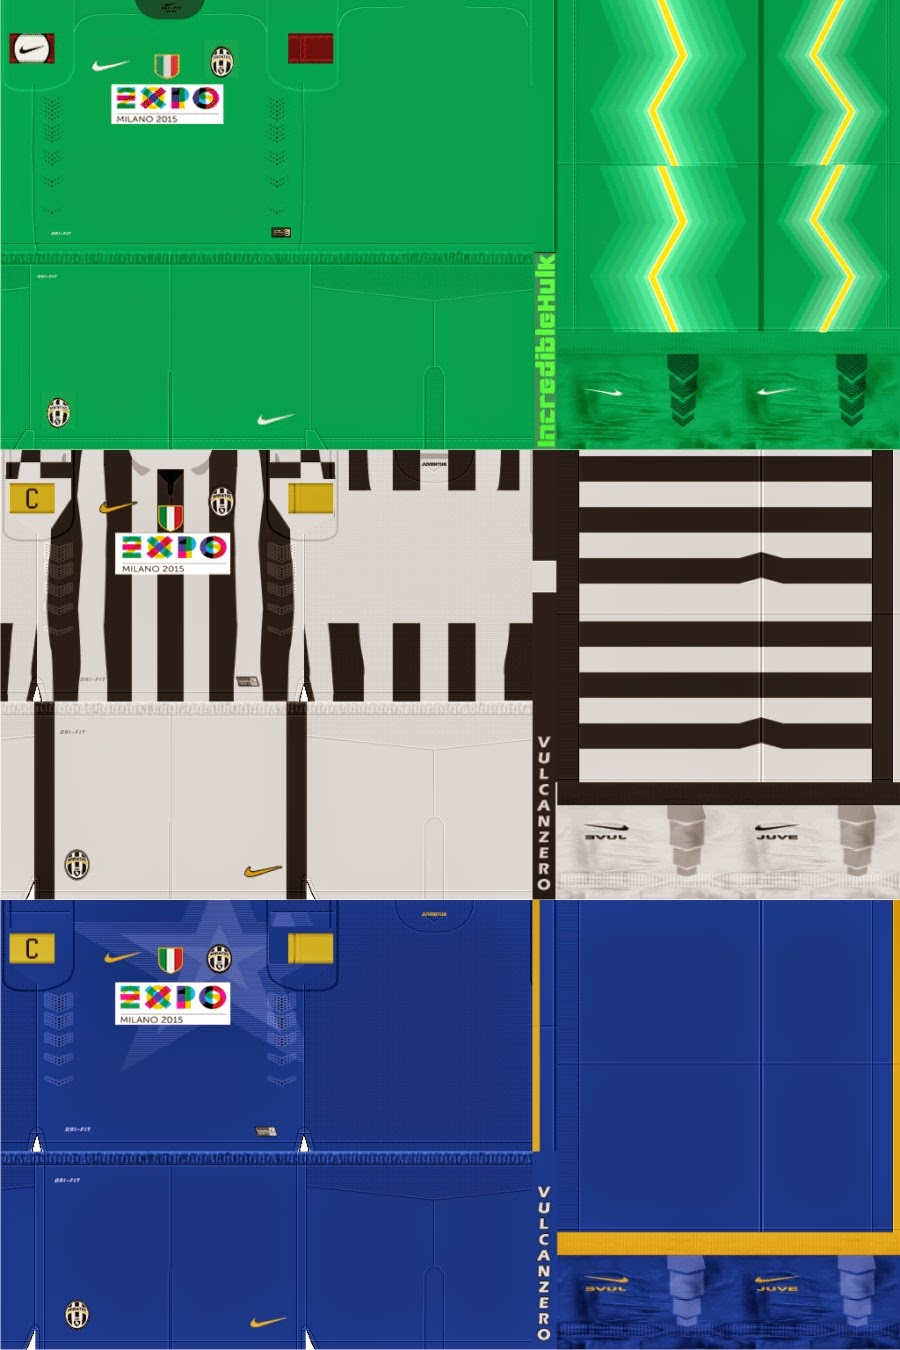 PES 2013 Juventus Sponsor Expo Milano Kits by Bocampeon